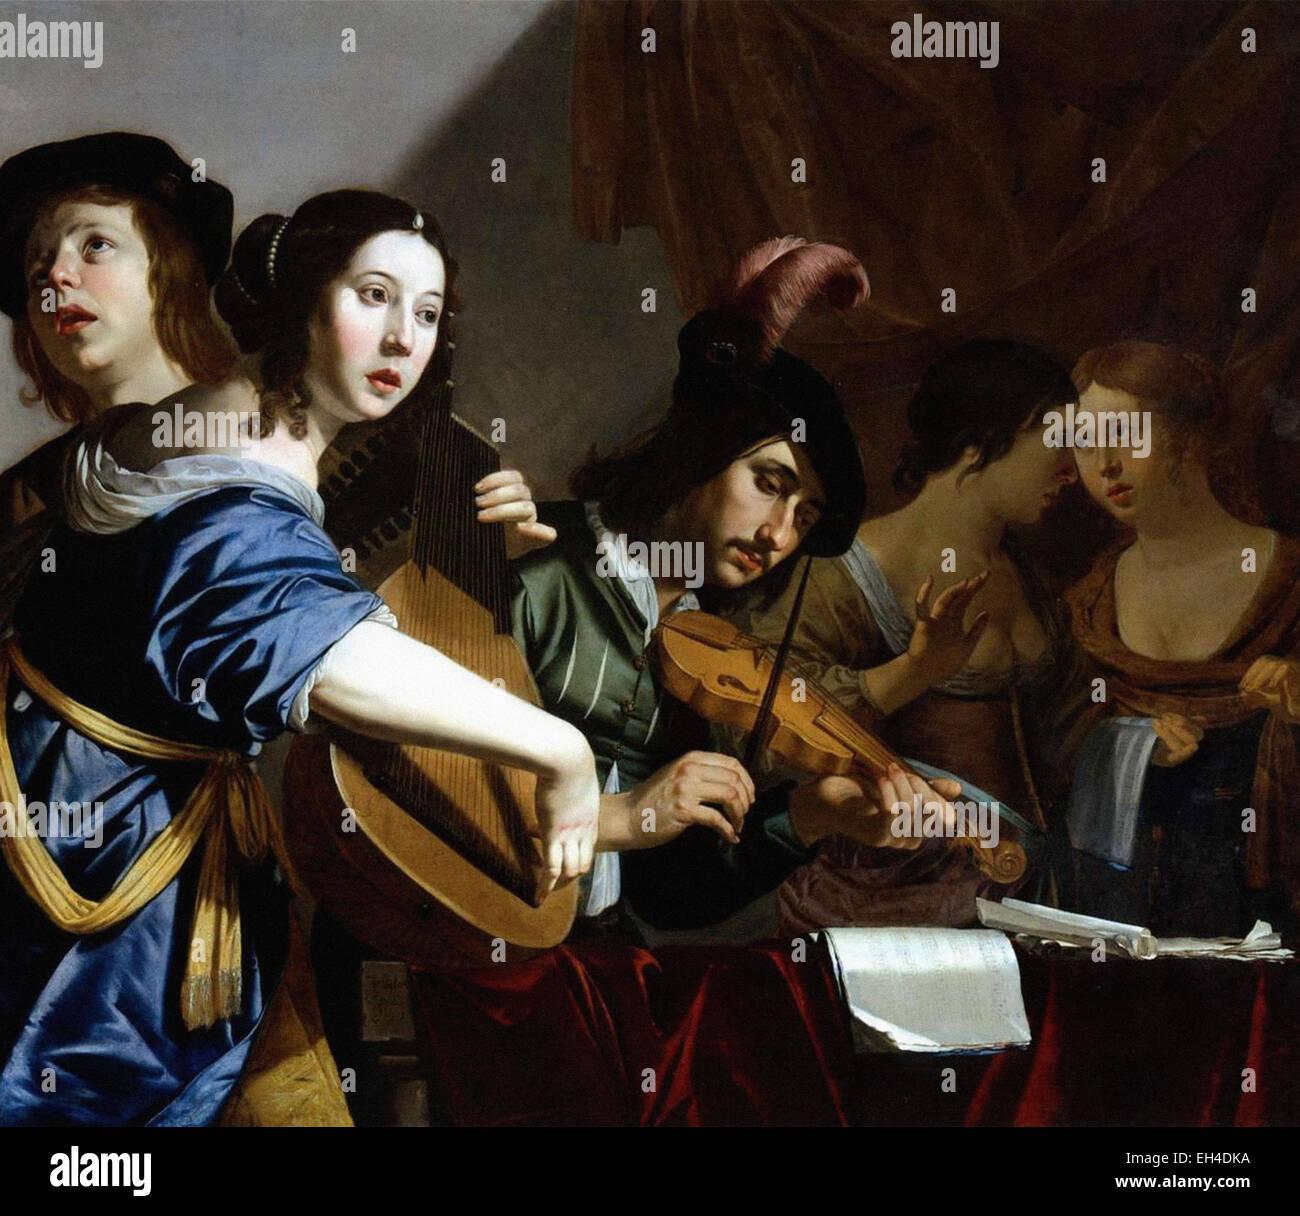 Jan van Bijlert  A Musical Company - Stock Image